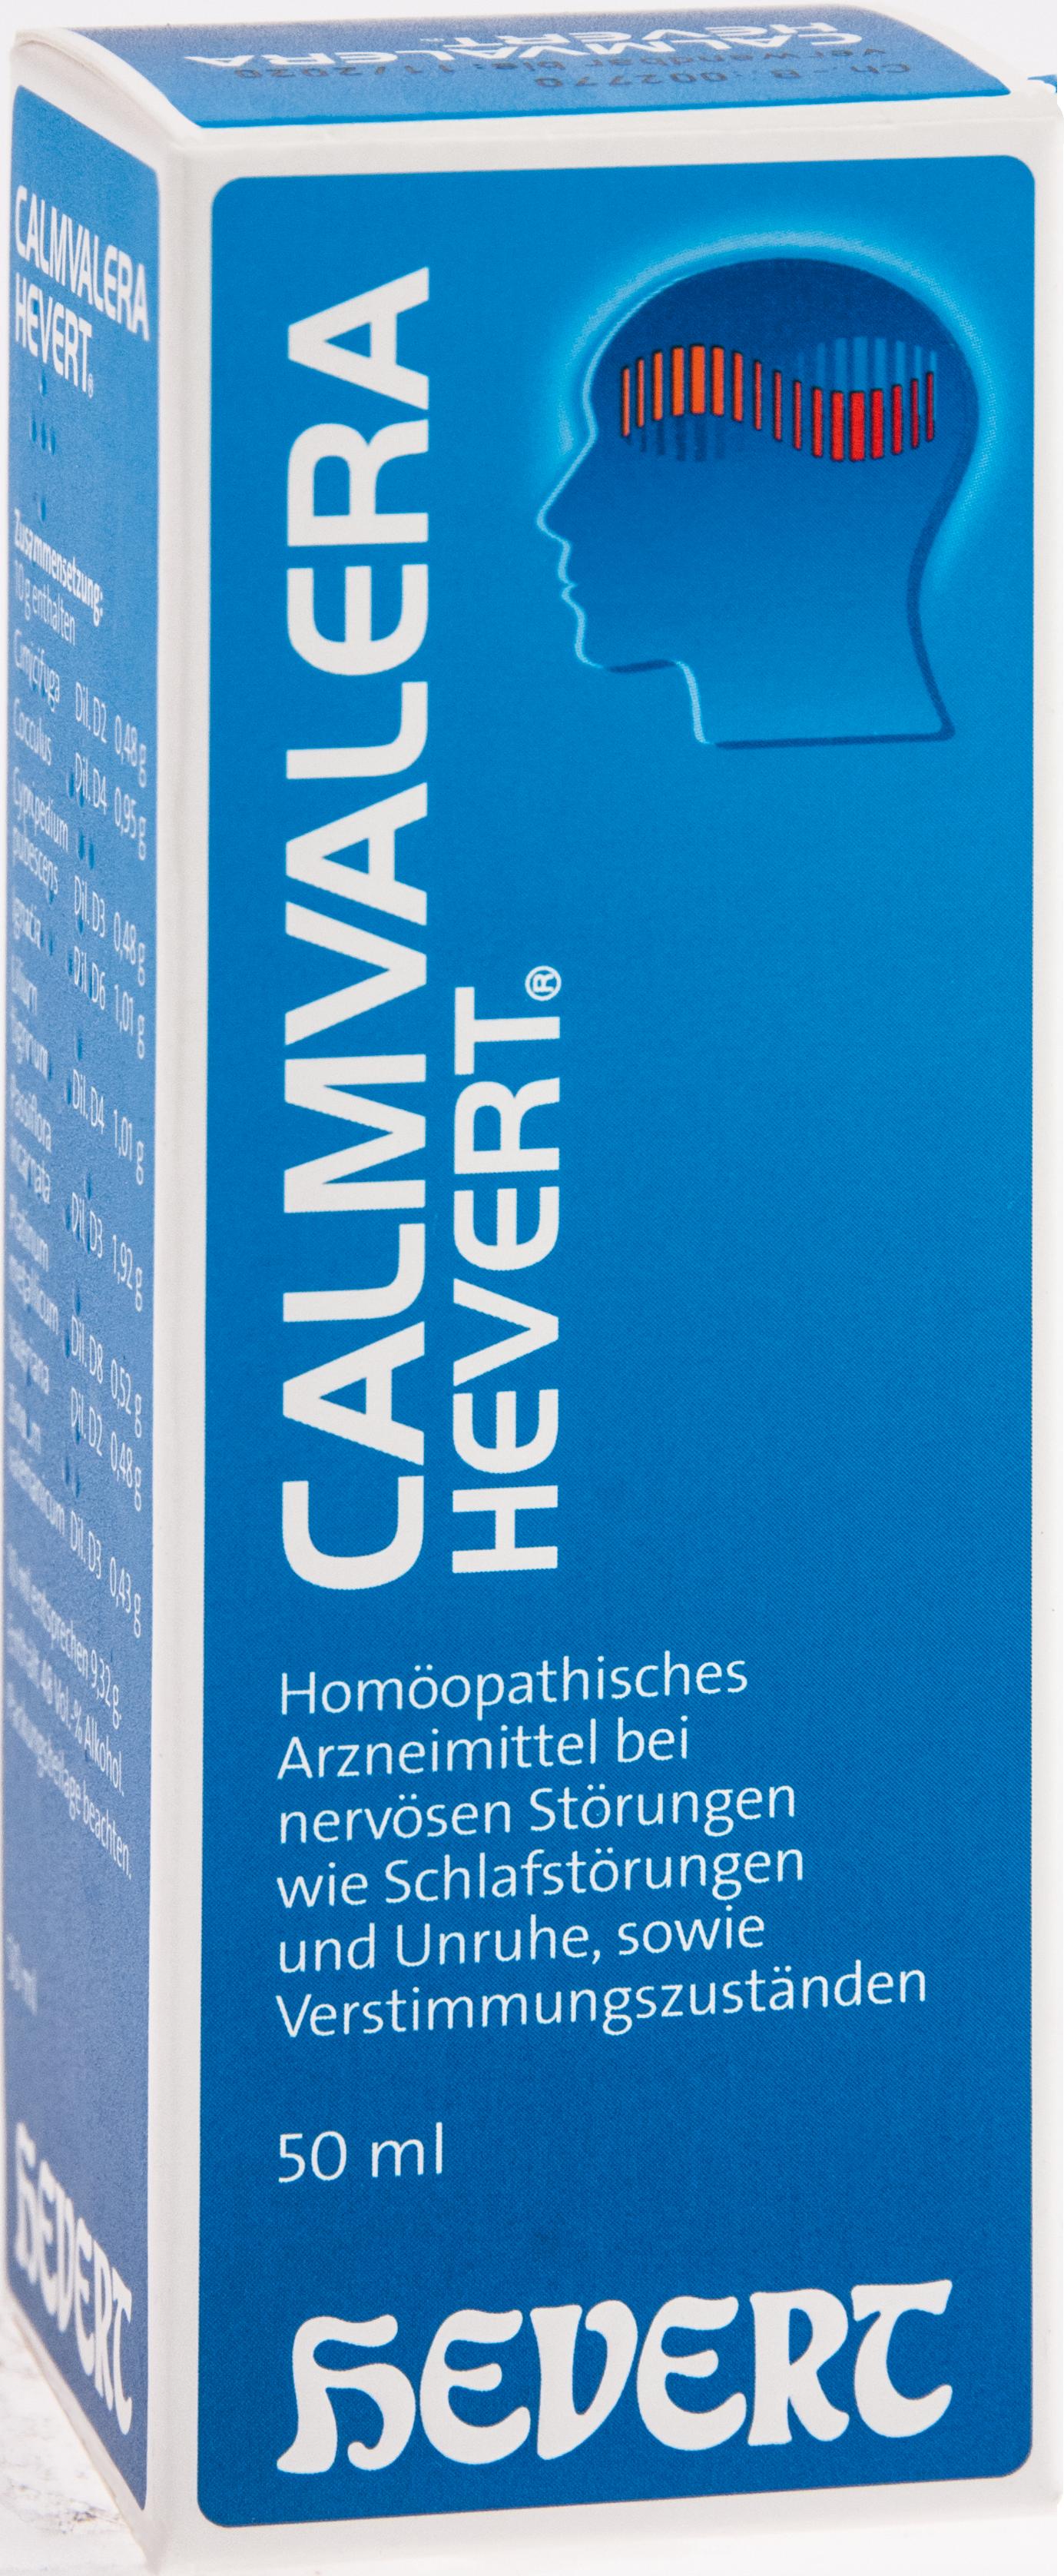 Calmvalera Hevert